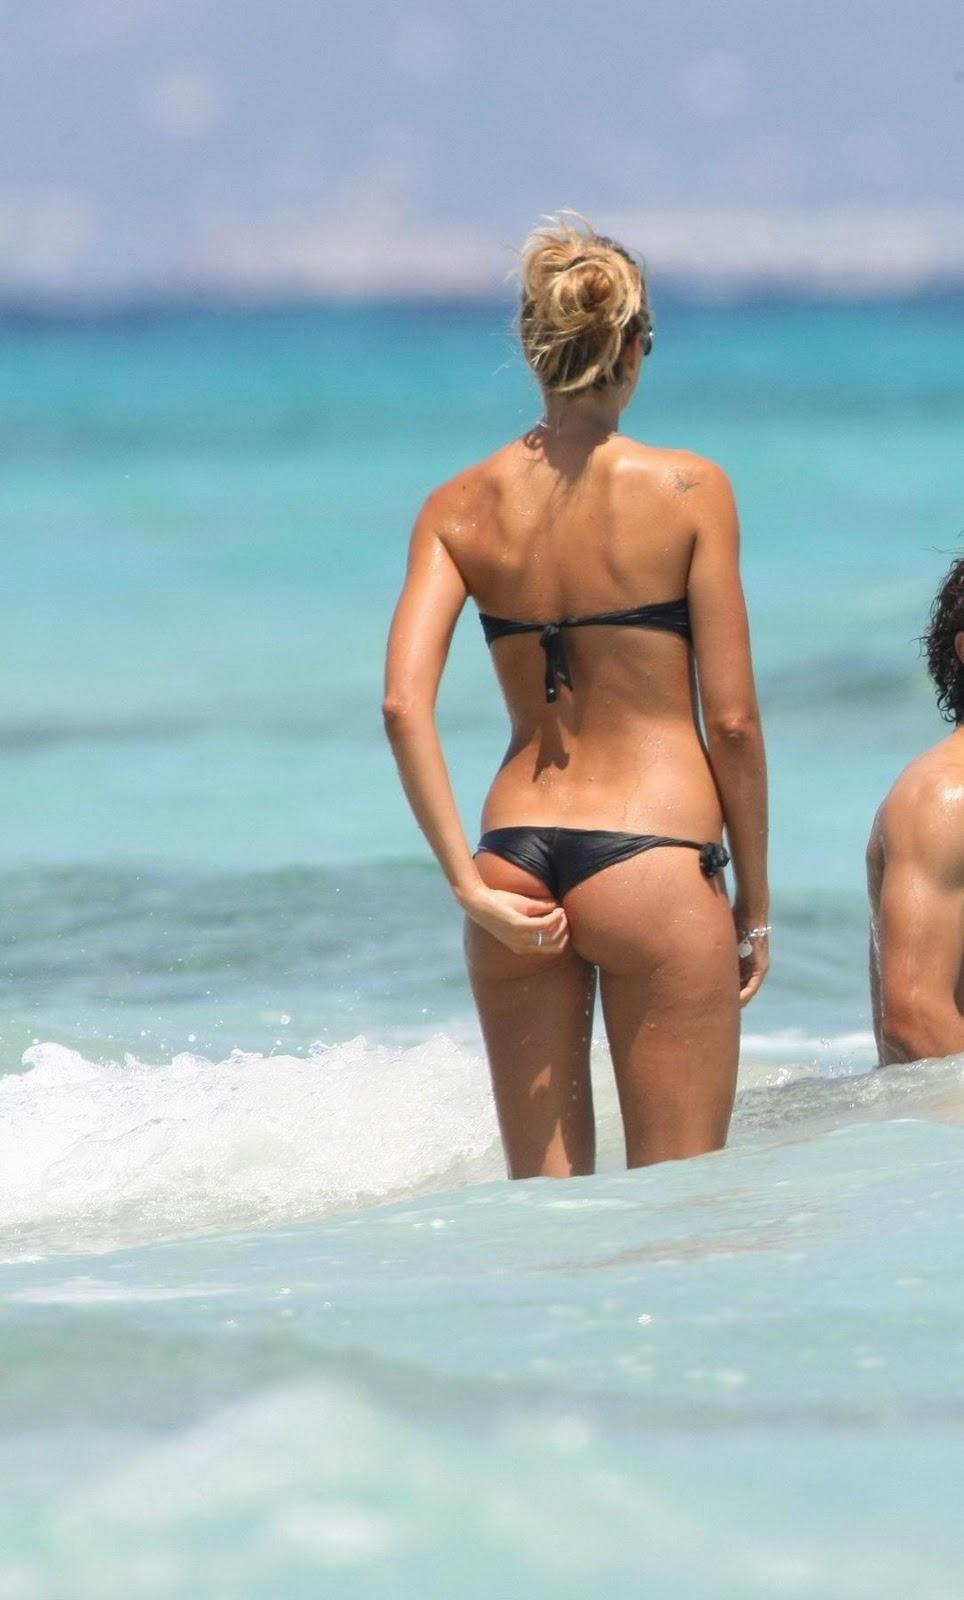 elena santarelli topless